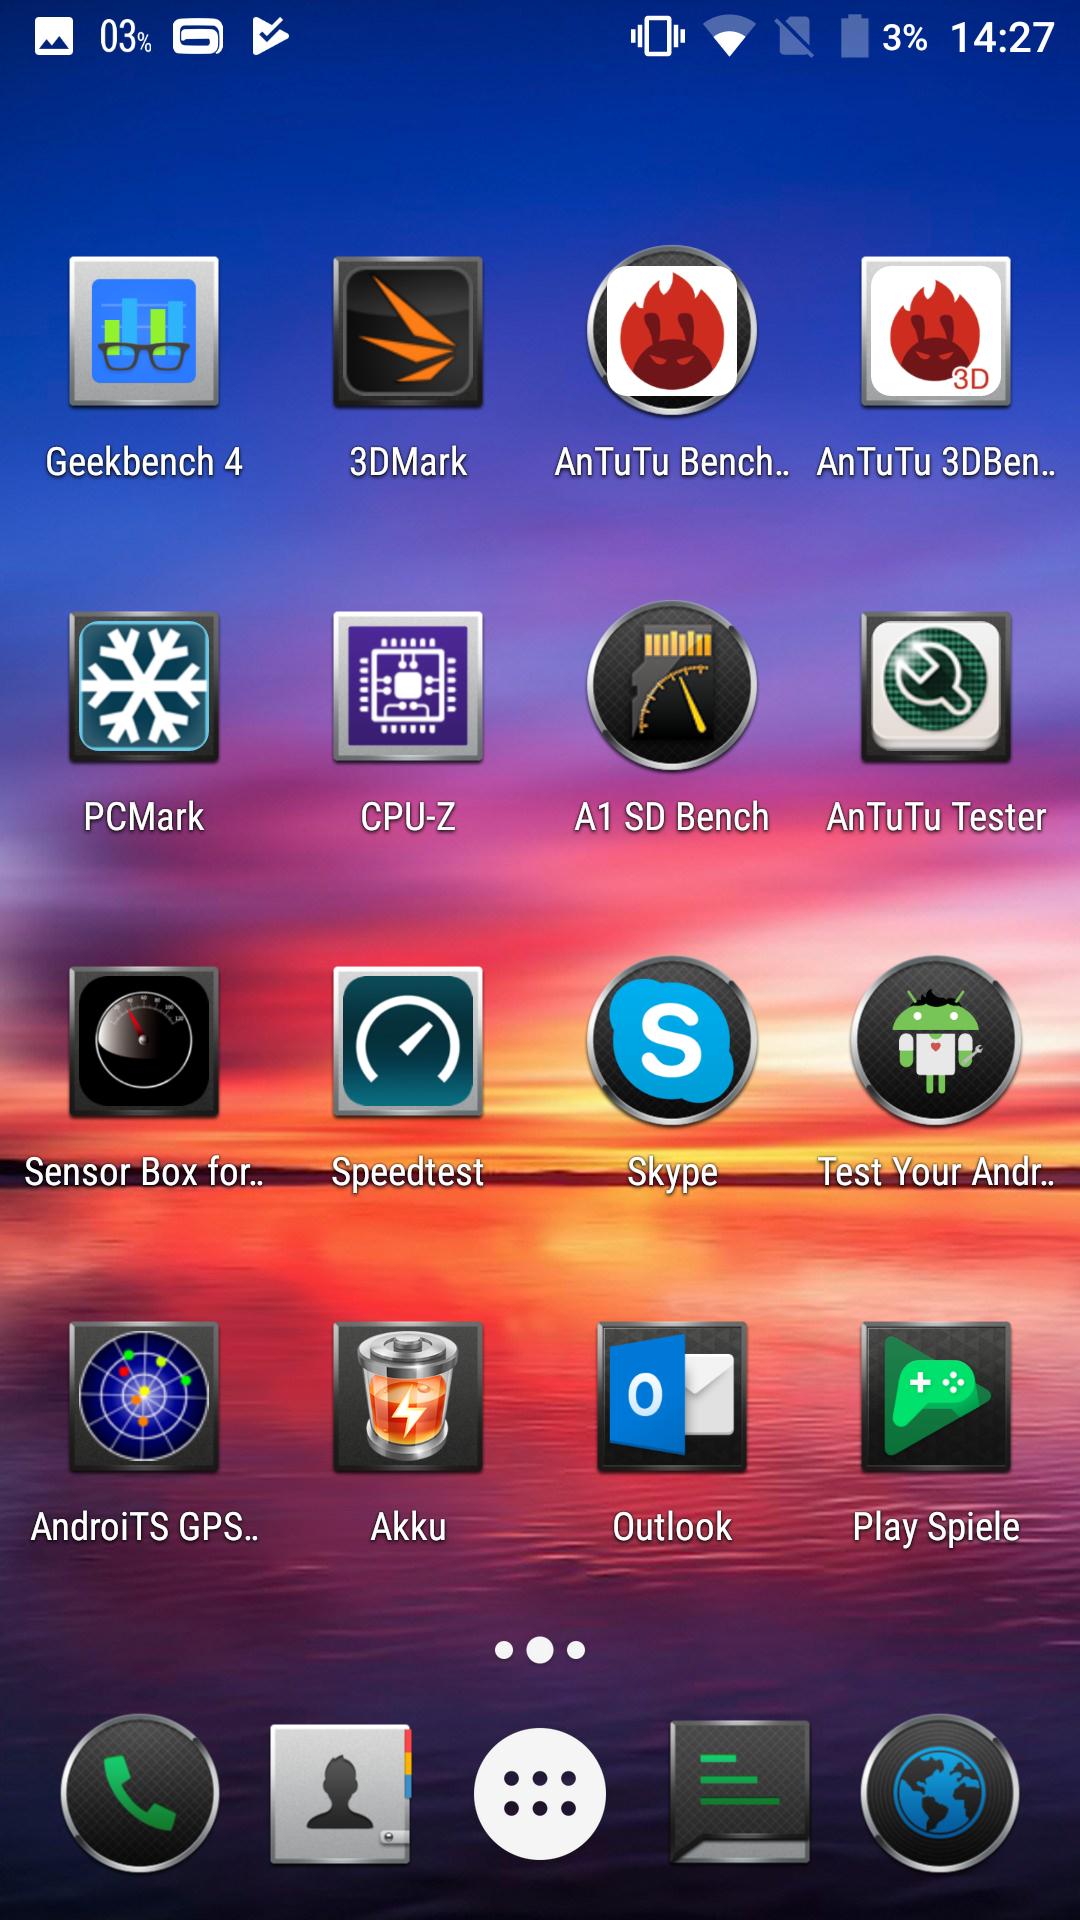 Oukitel K10000 Pro Android 3